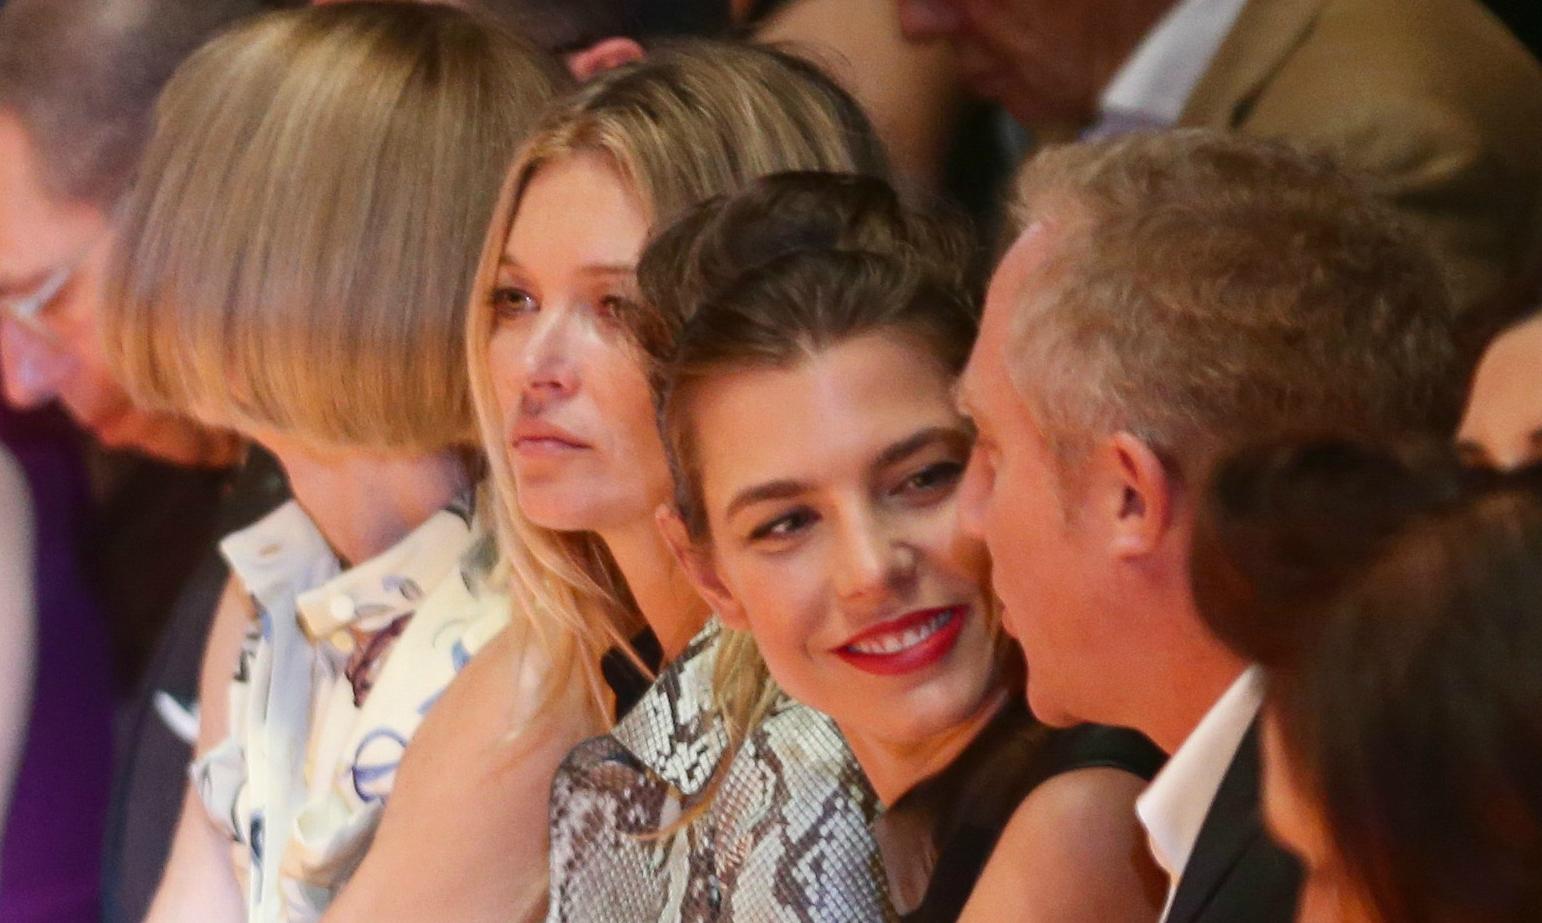 Kate Moss vs Charlotte Casiraghi, scontro tra regine di stile a Milano (FOTO)